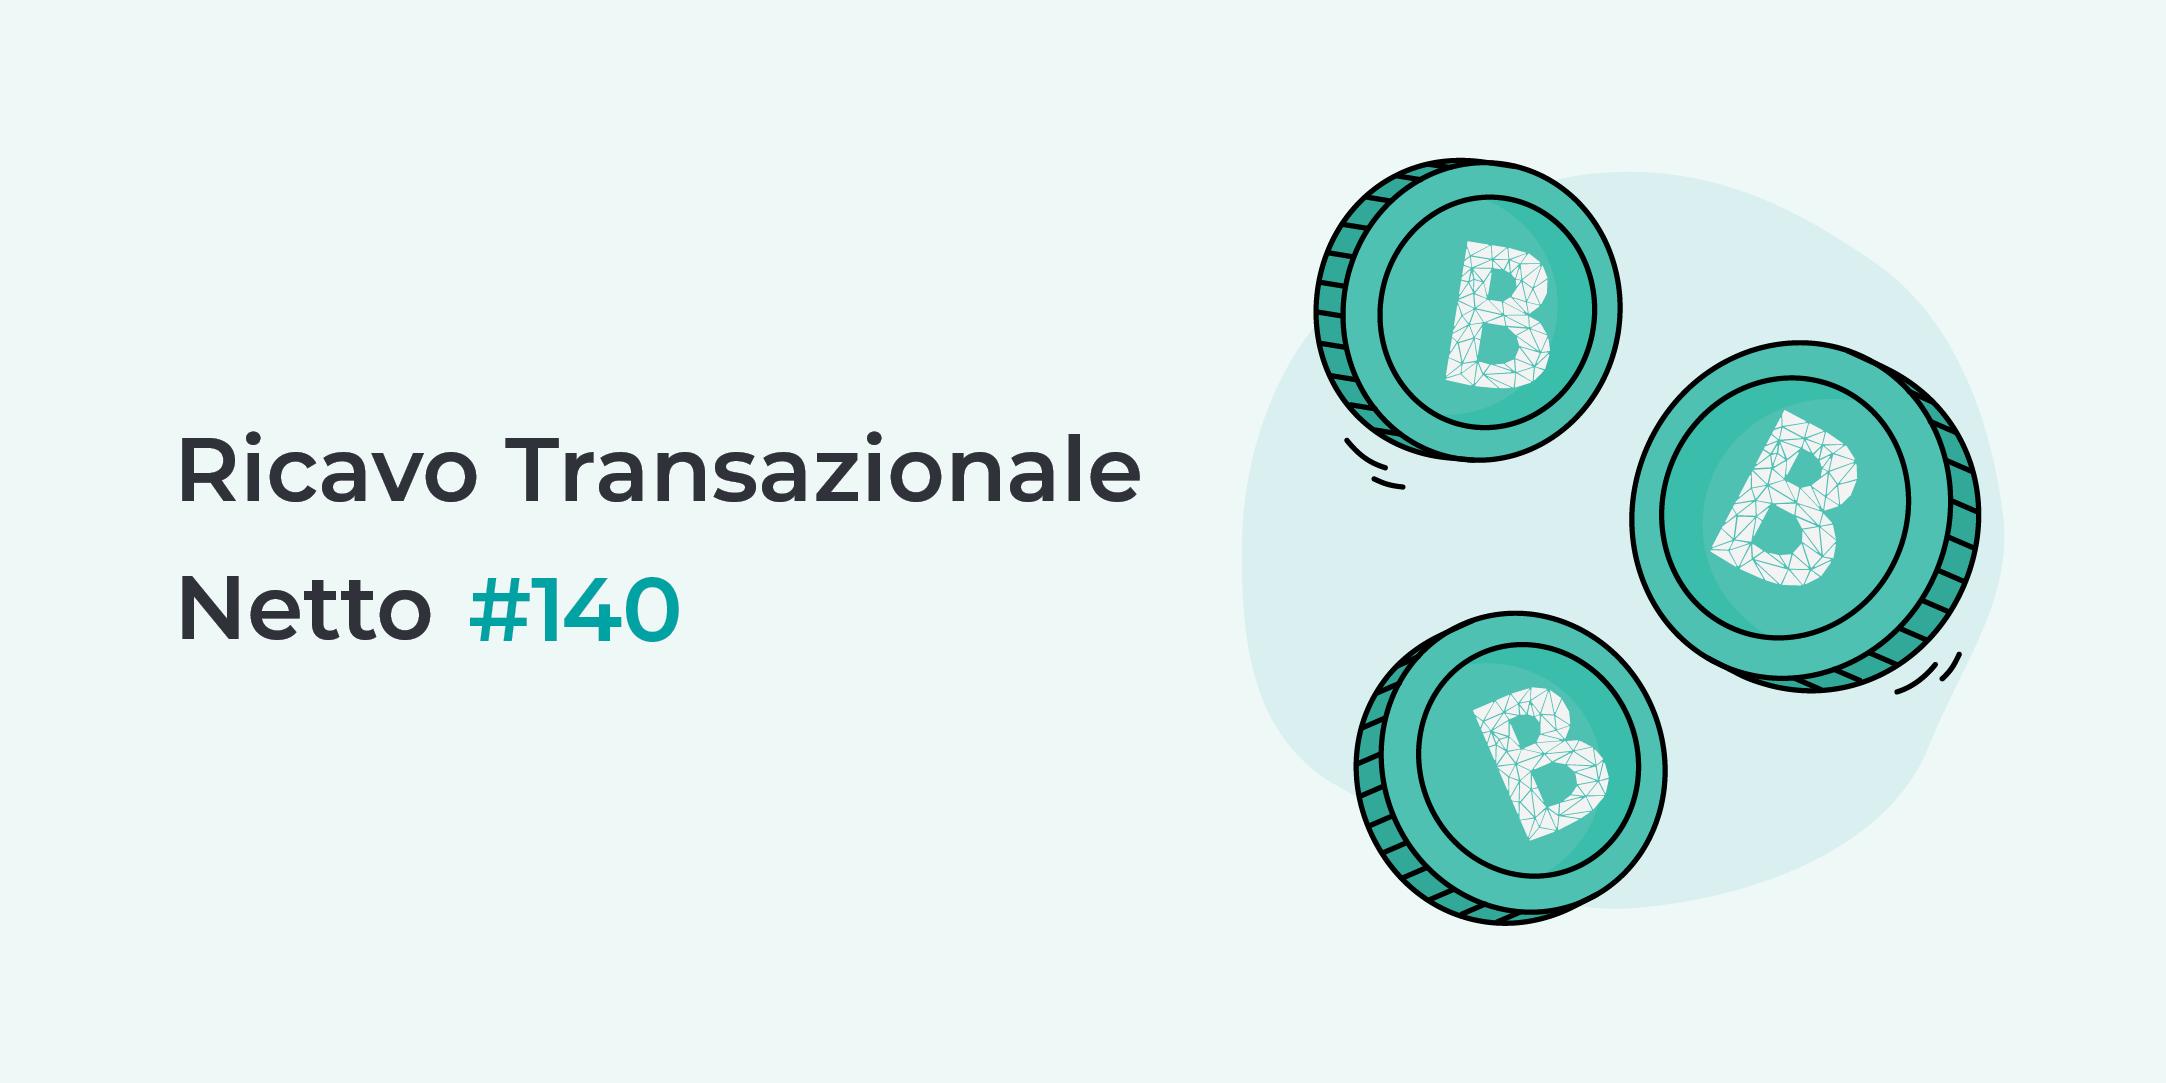 Net Transactional Revenue Number 140